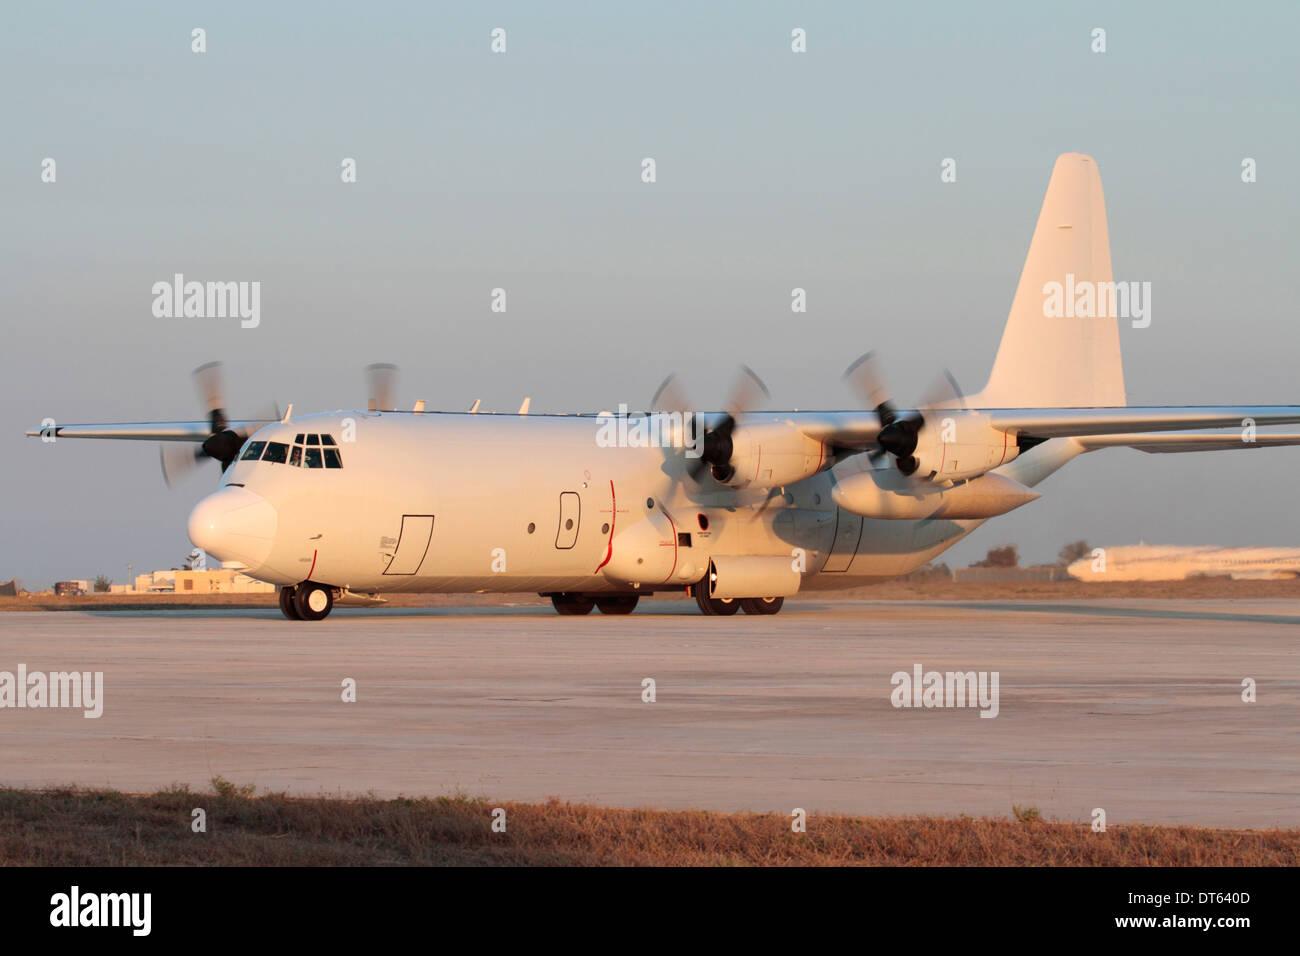 Civil-registered Lockheed L-100-30 Hercules turboprop cargo plane on arrival in Malta in transit - Stock Image